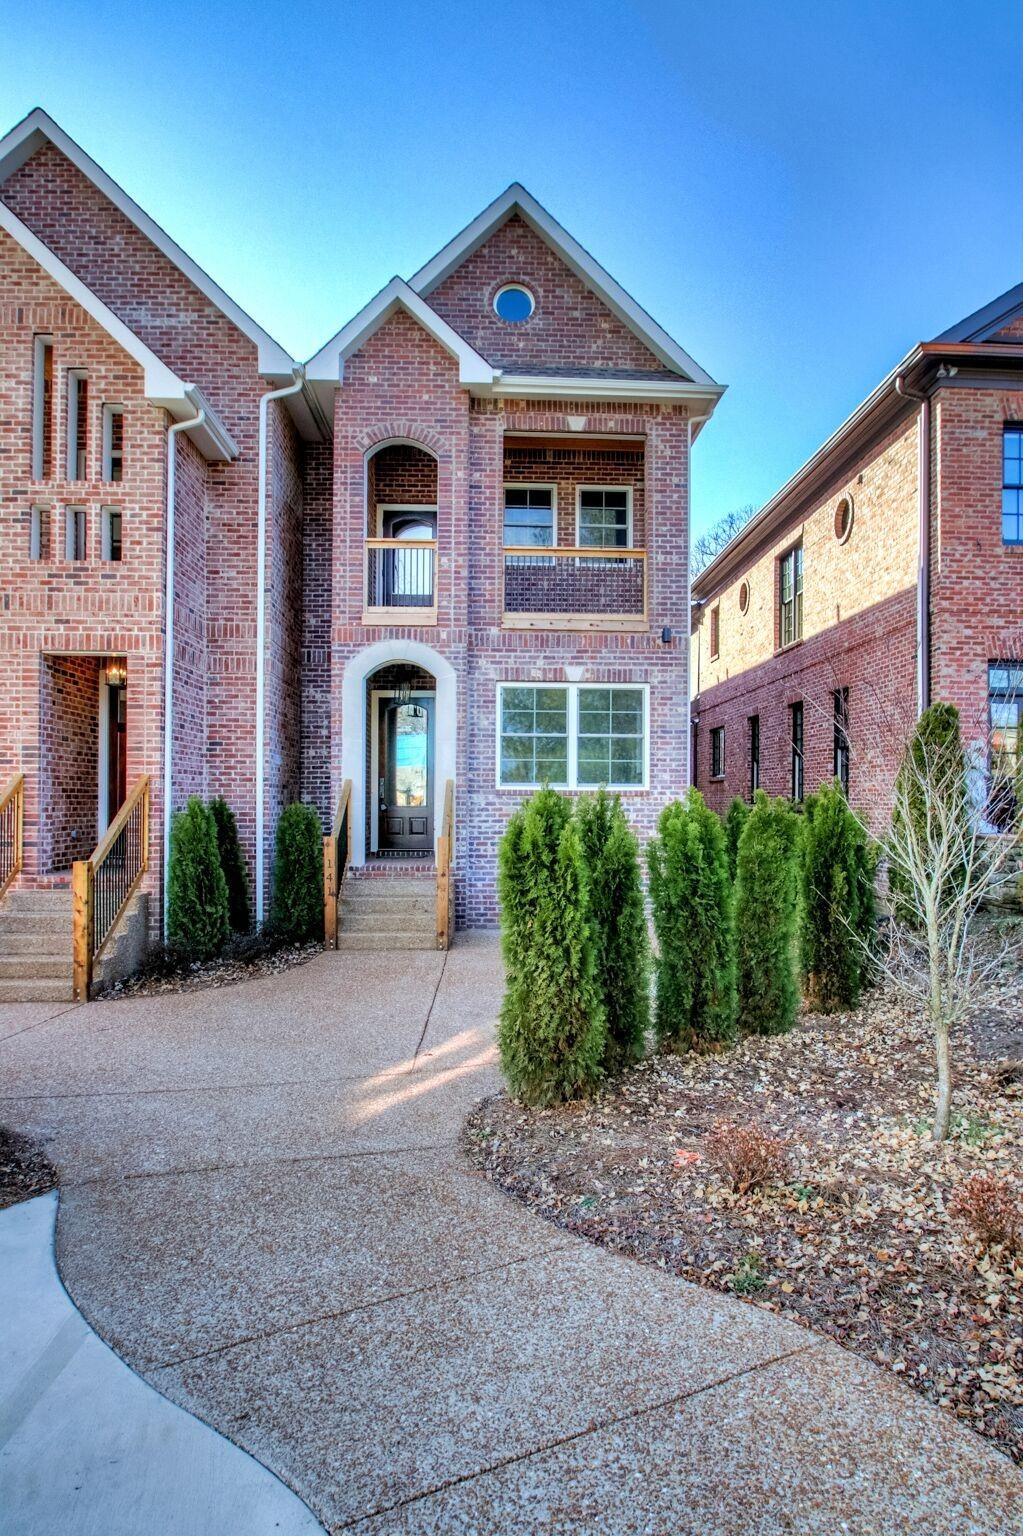 141 Woodmont Blvd Property Photo - Nashville, TN real estate listing